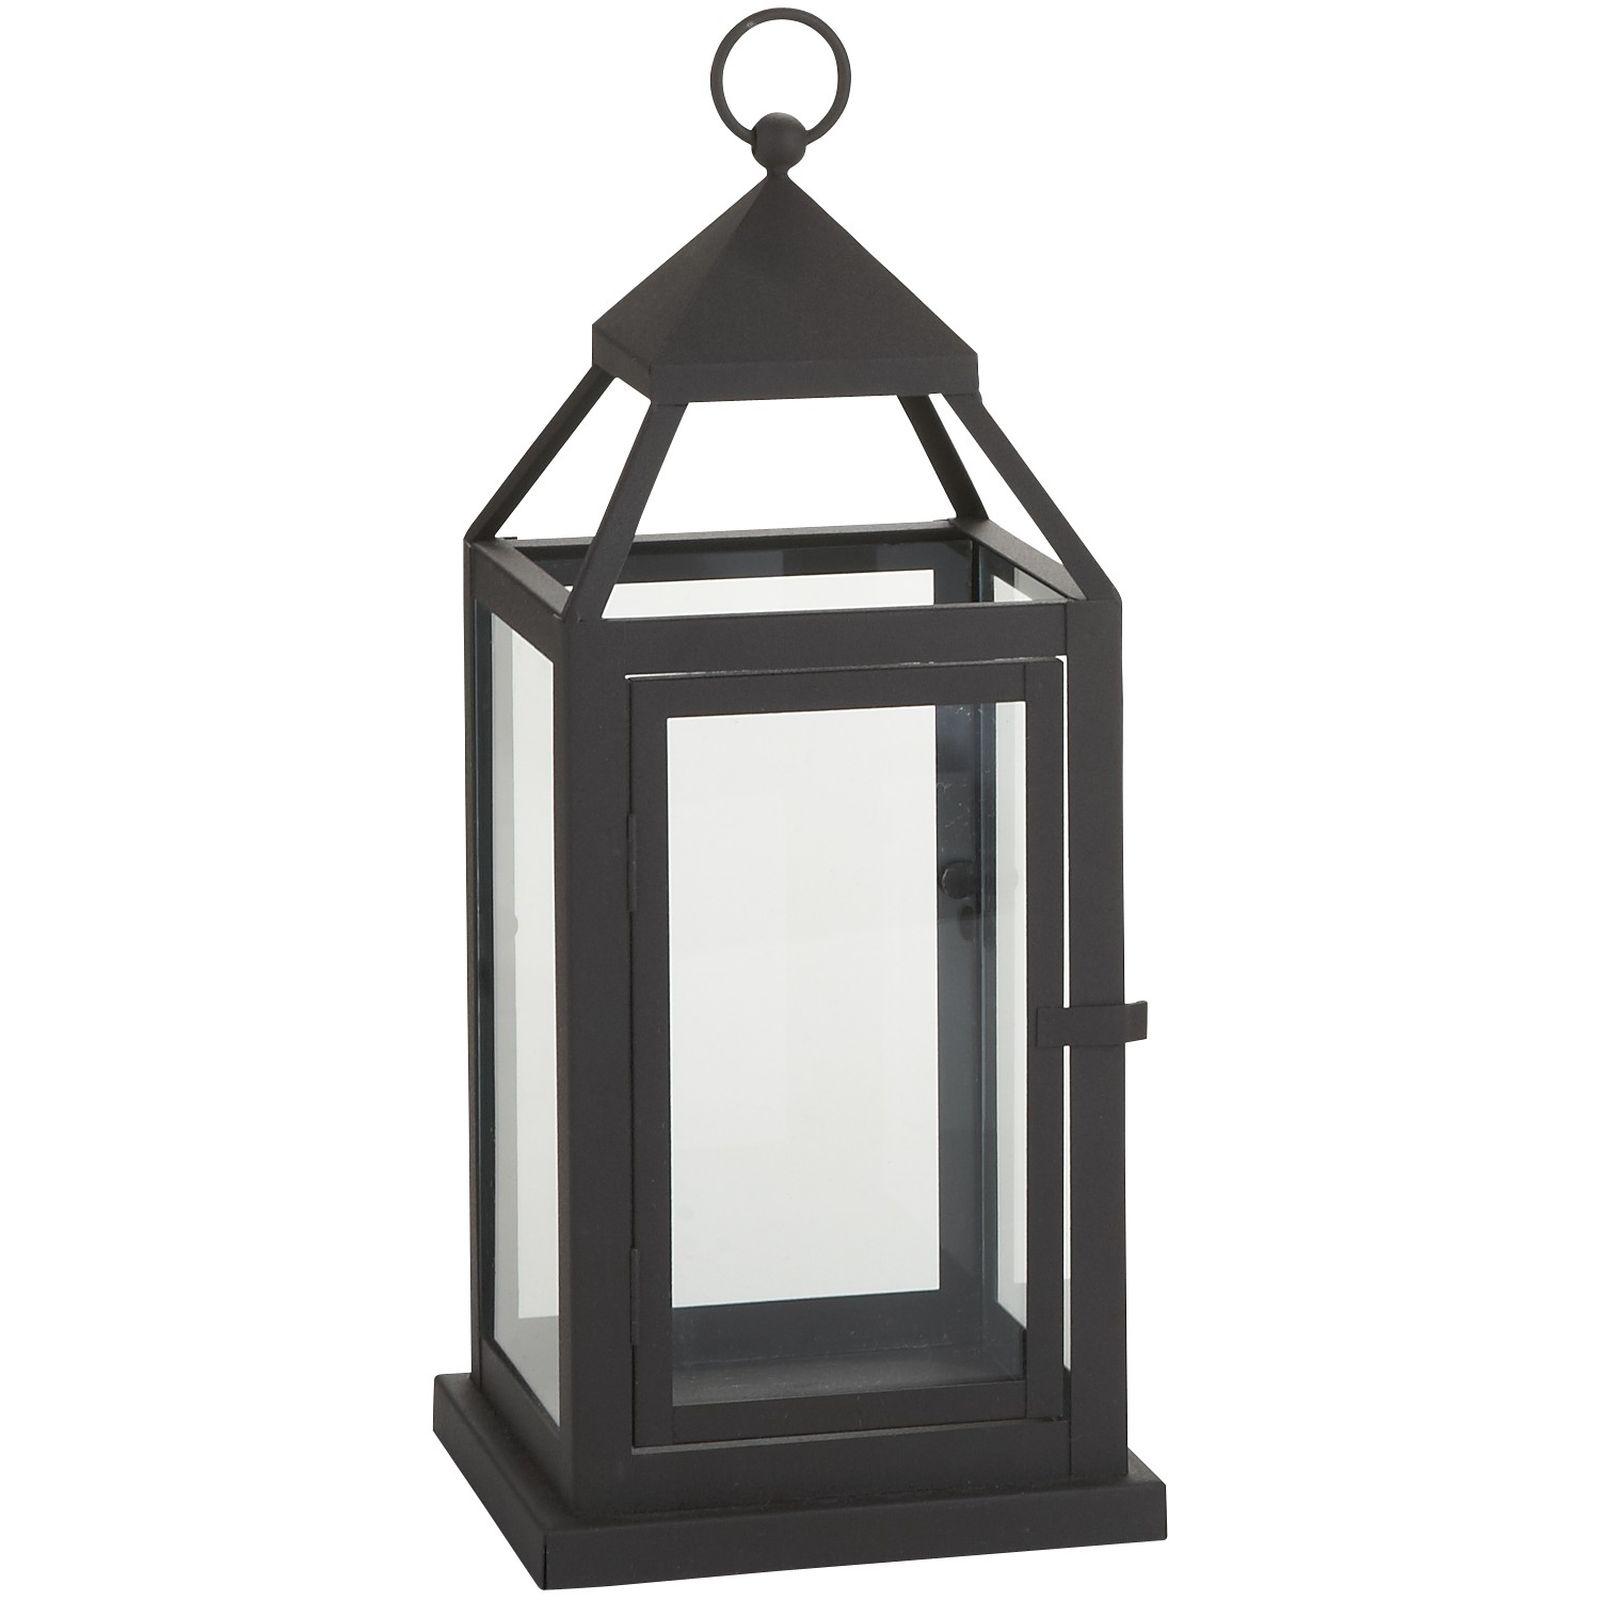 Landen Small Black Metal Lantern | Pier 1 Imports